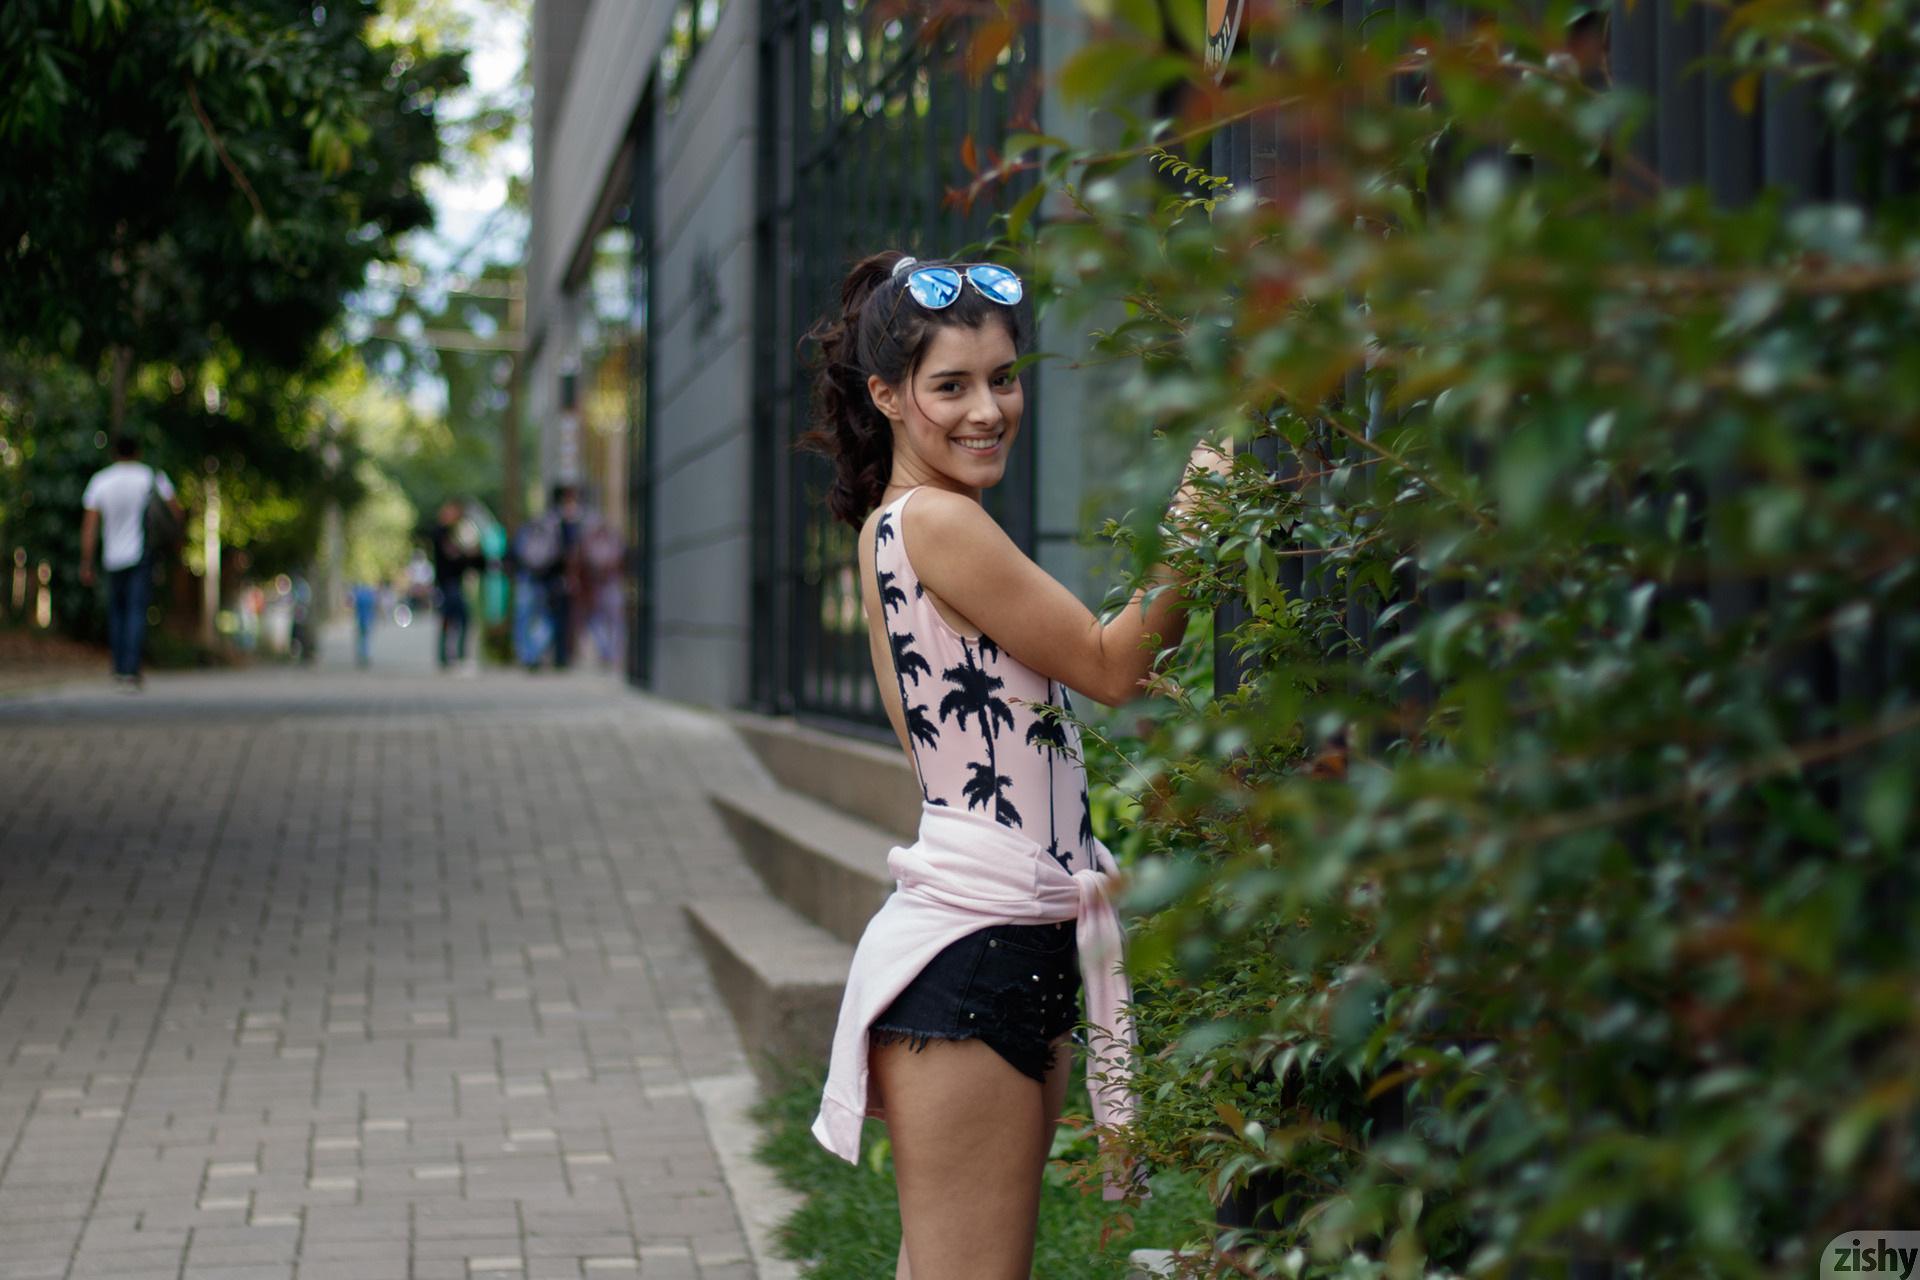 Kate Maze Skates Colombia Zishy (8)